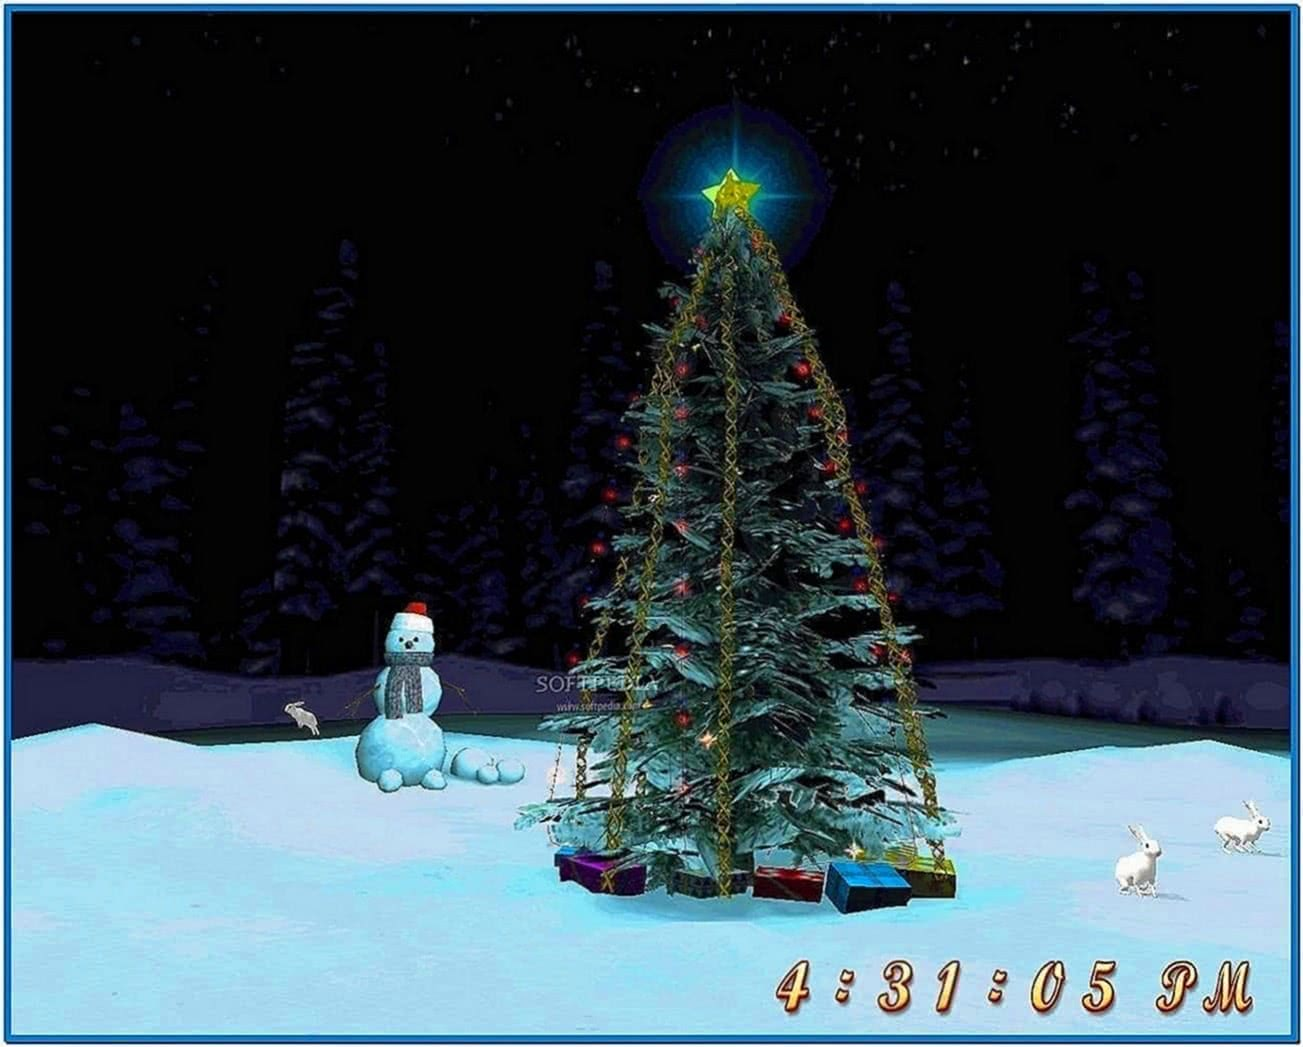 Christmas Tree 3D Screensaver Full